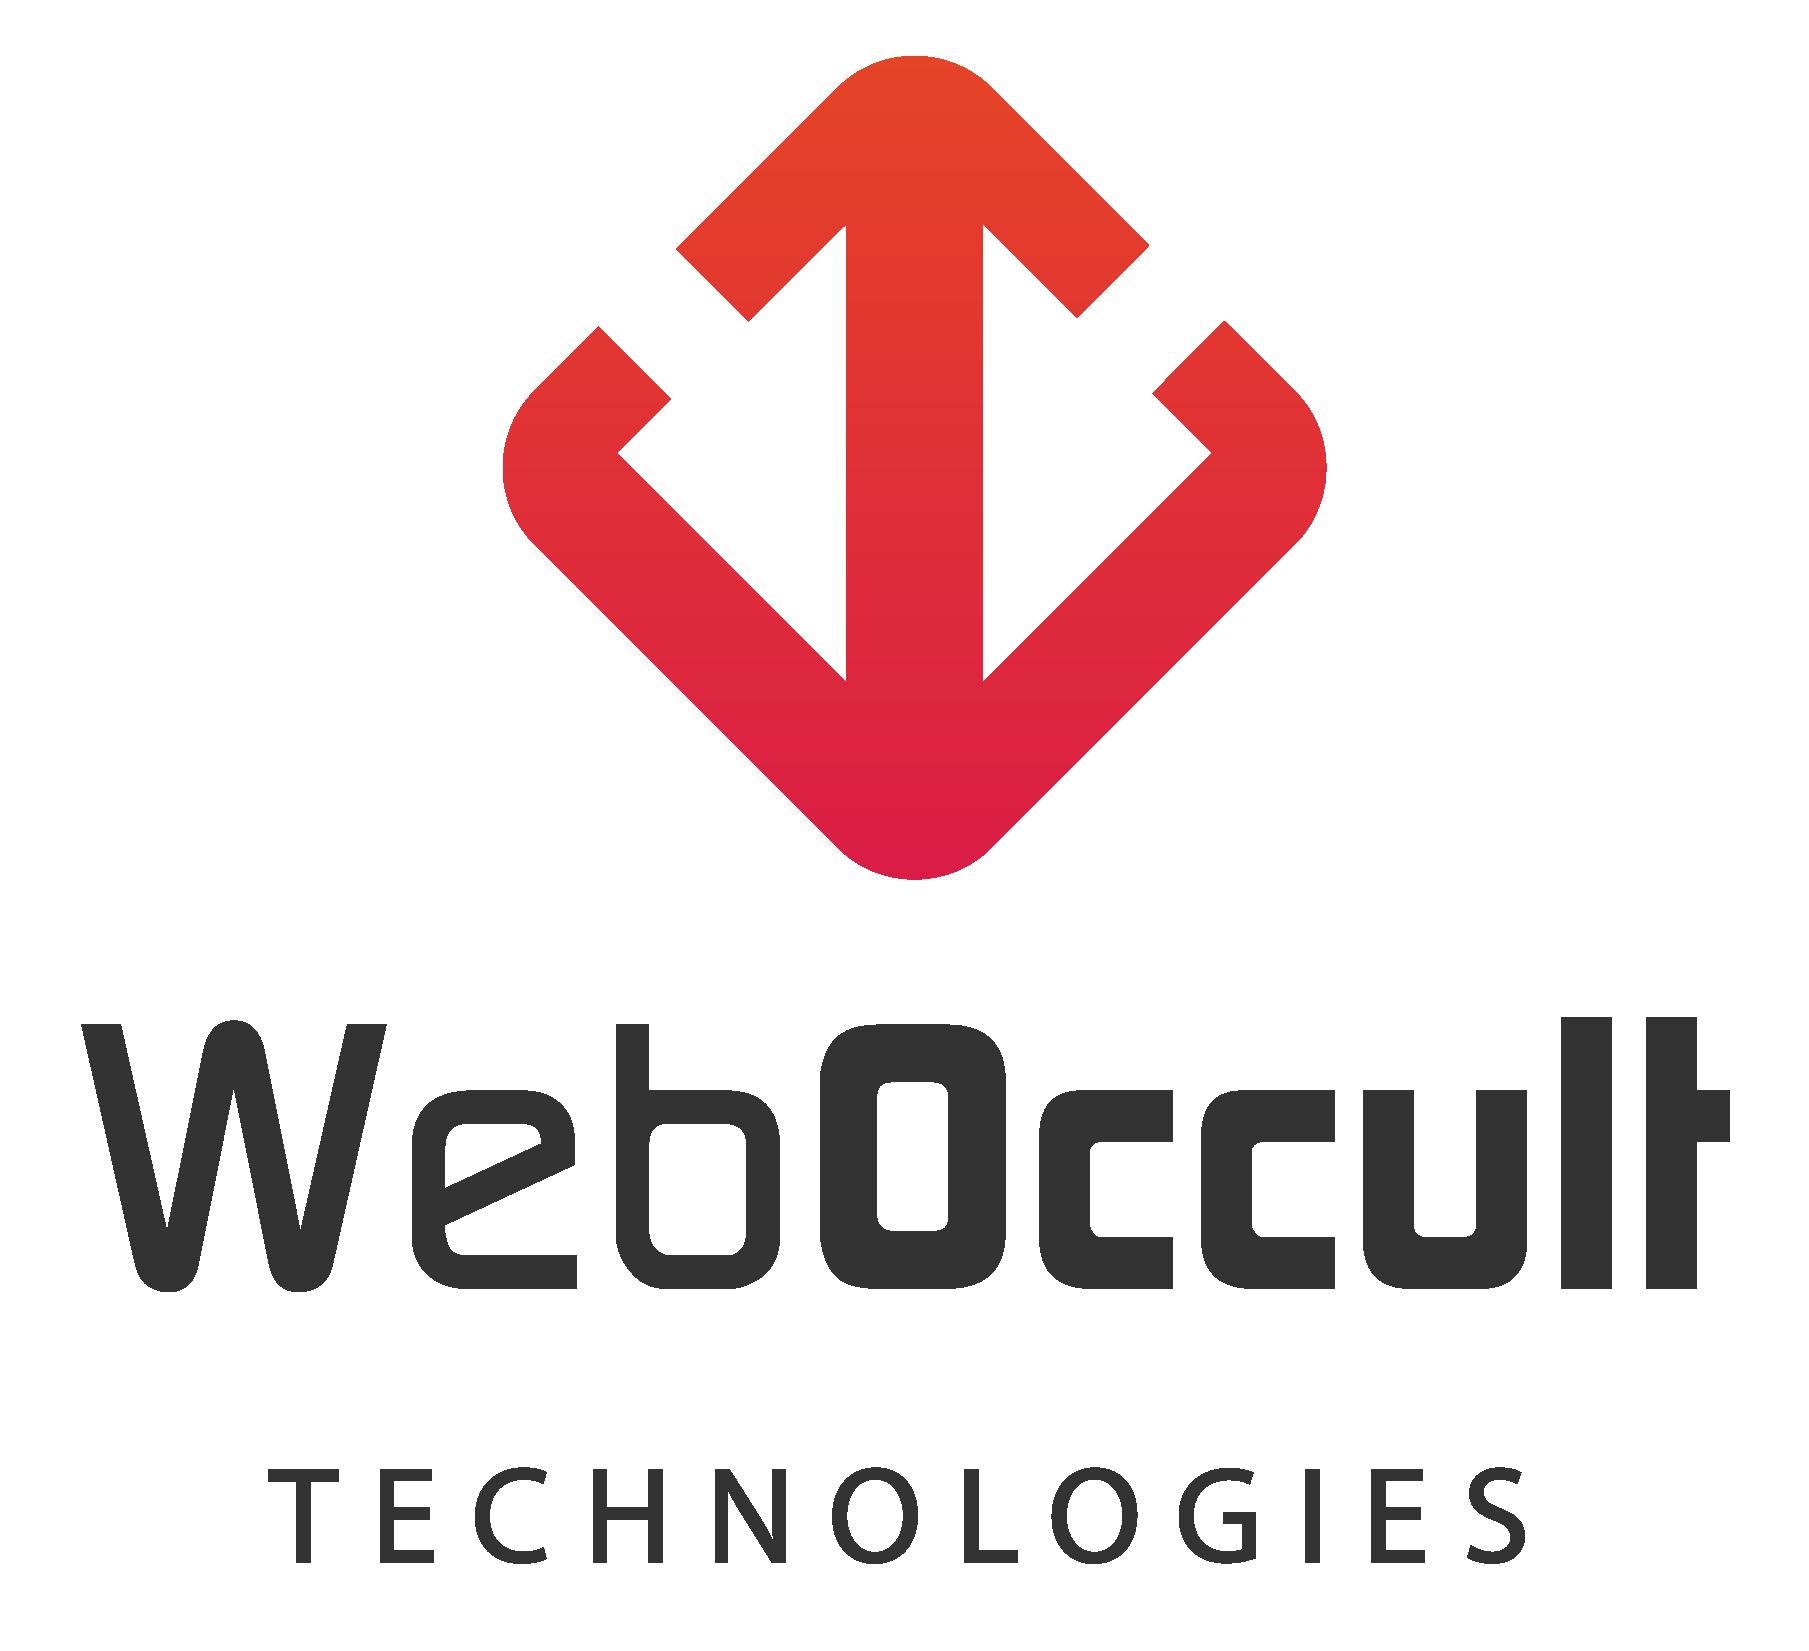 Weboccult Technologies Pvt. Ltd.